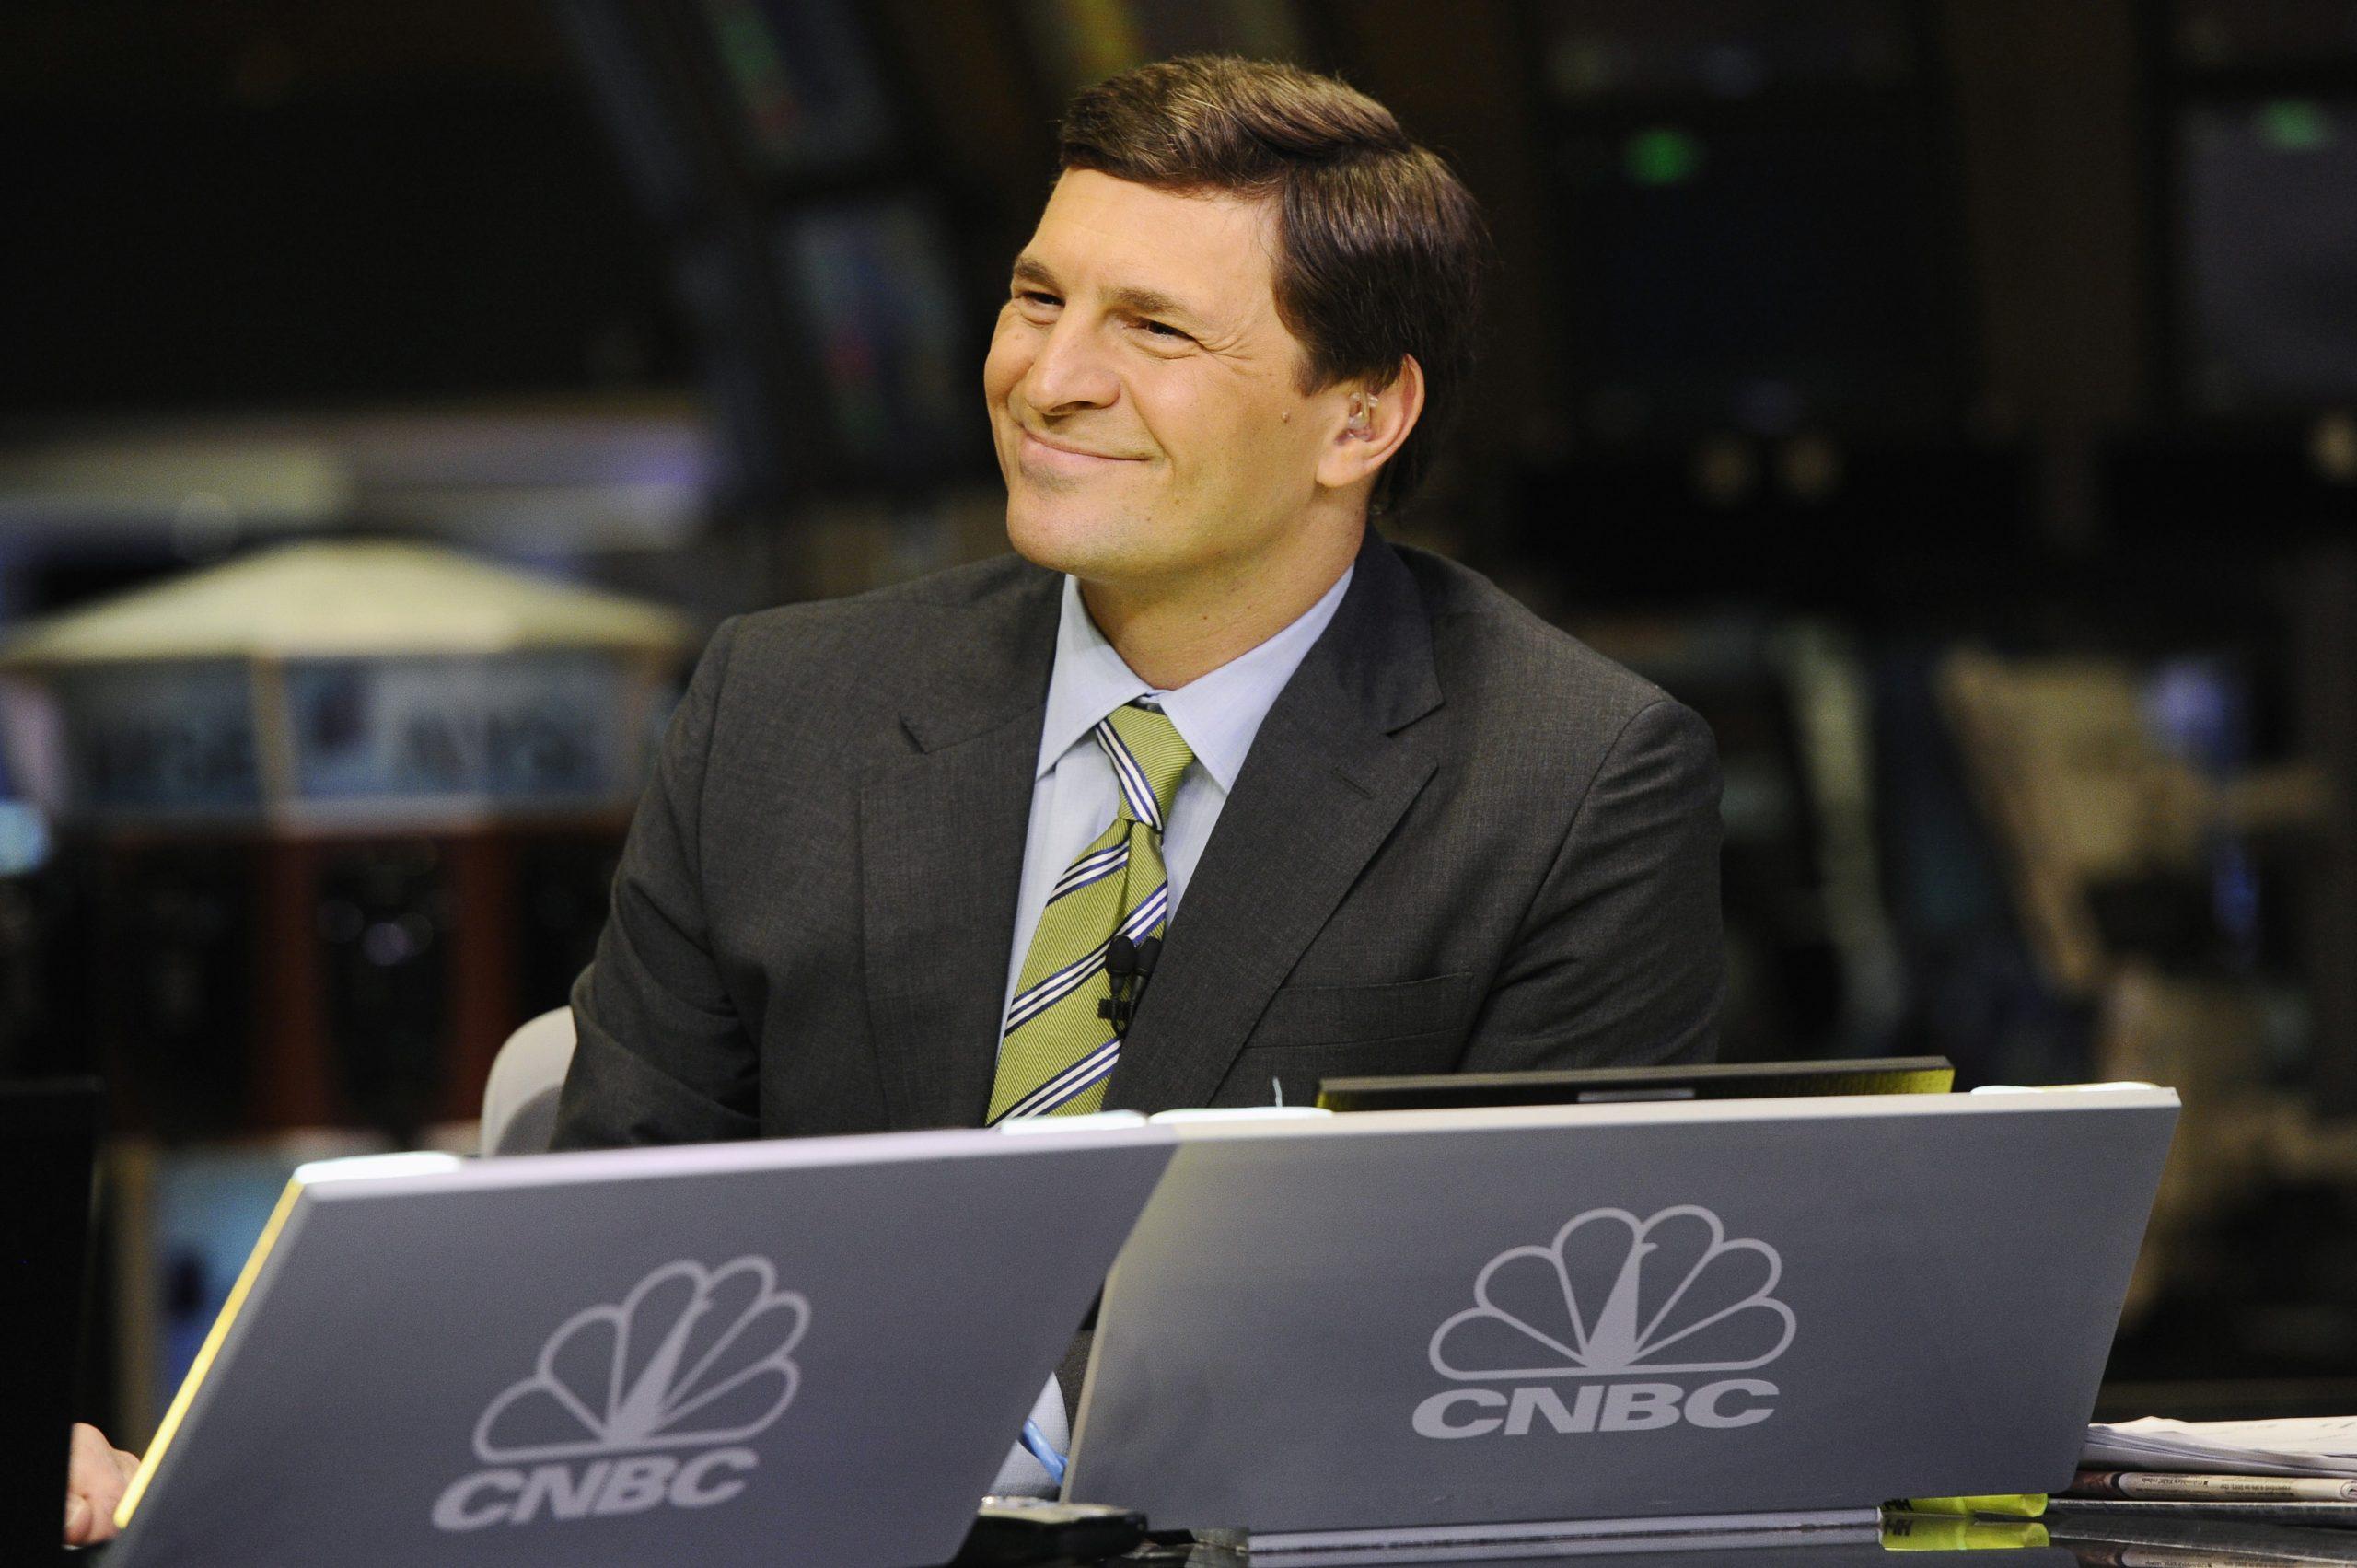 Anchor David Faber on set at CNBC